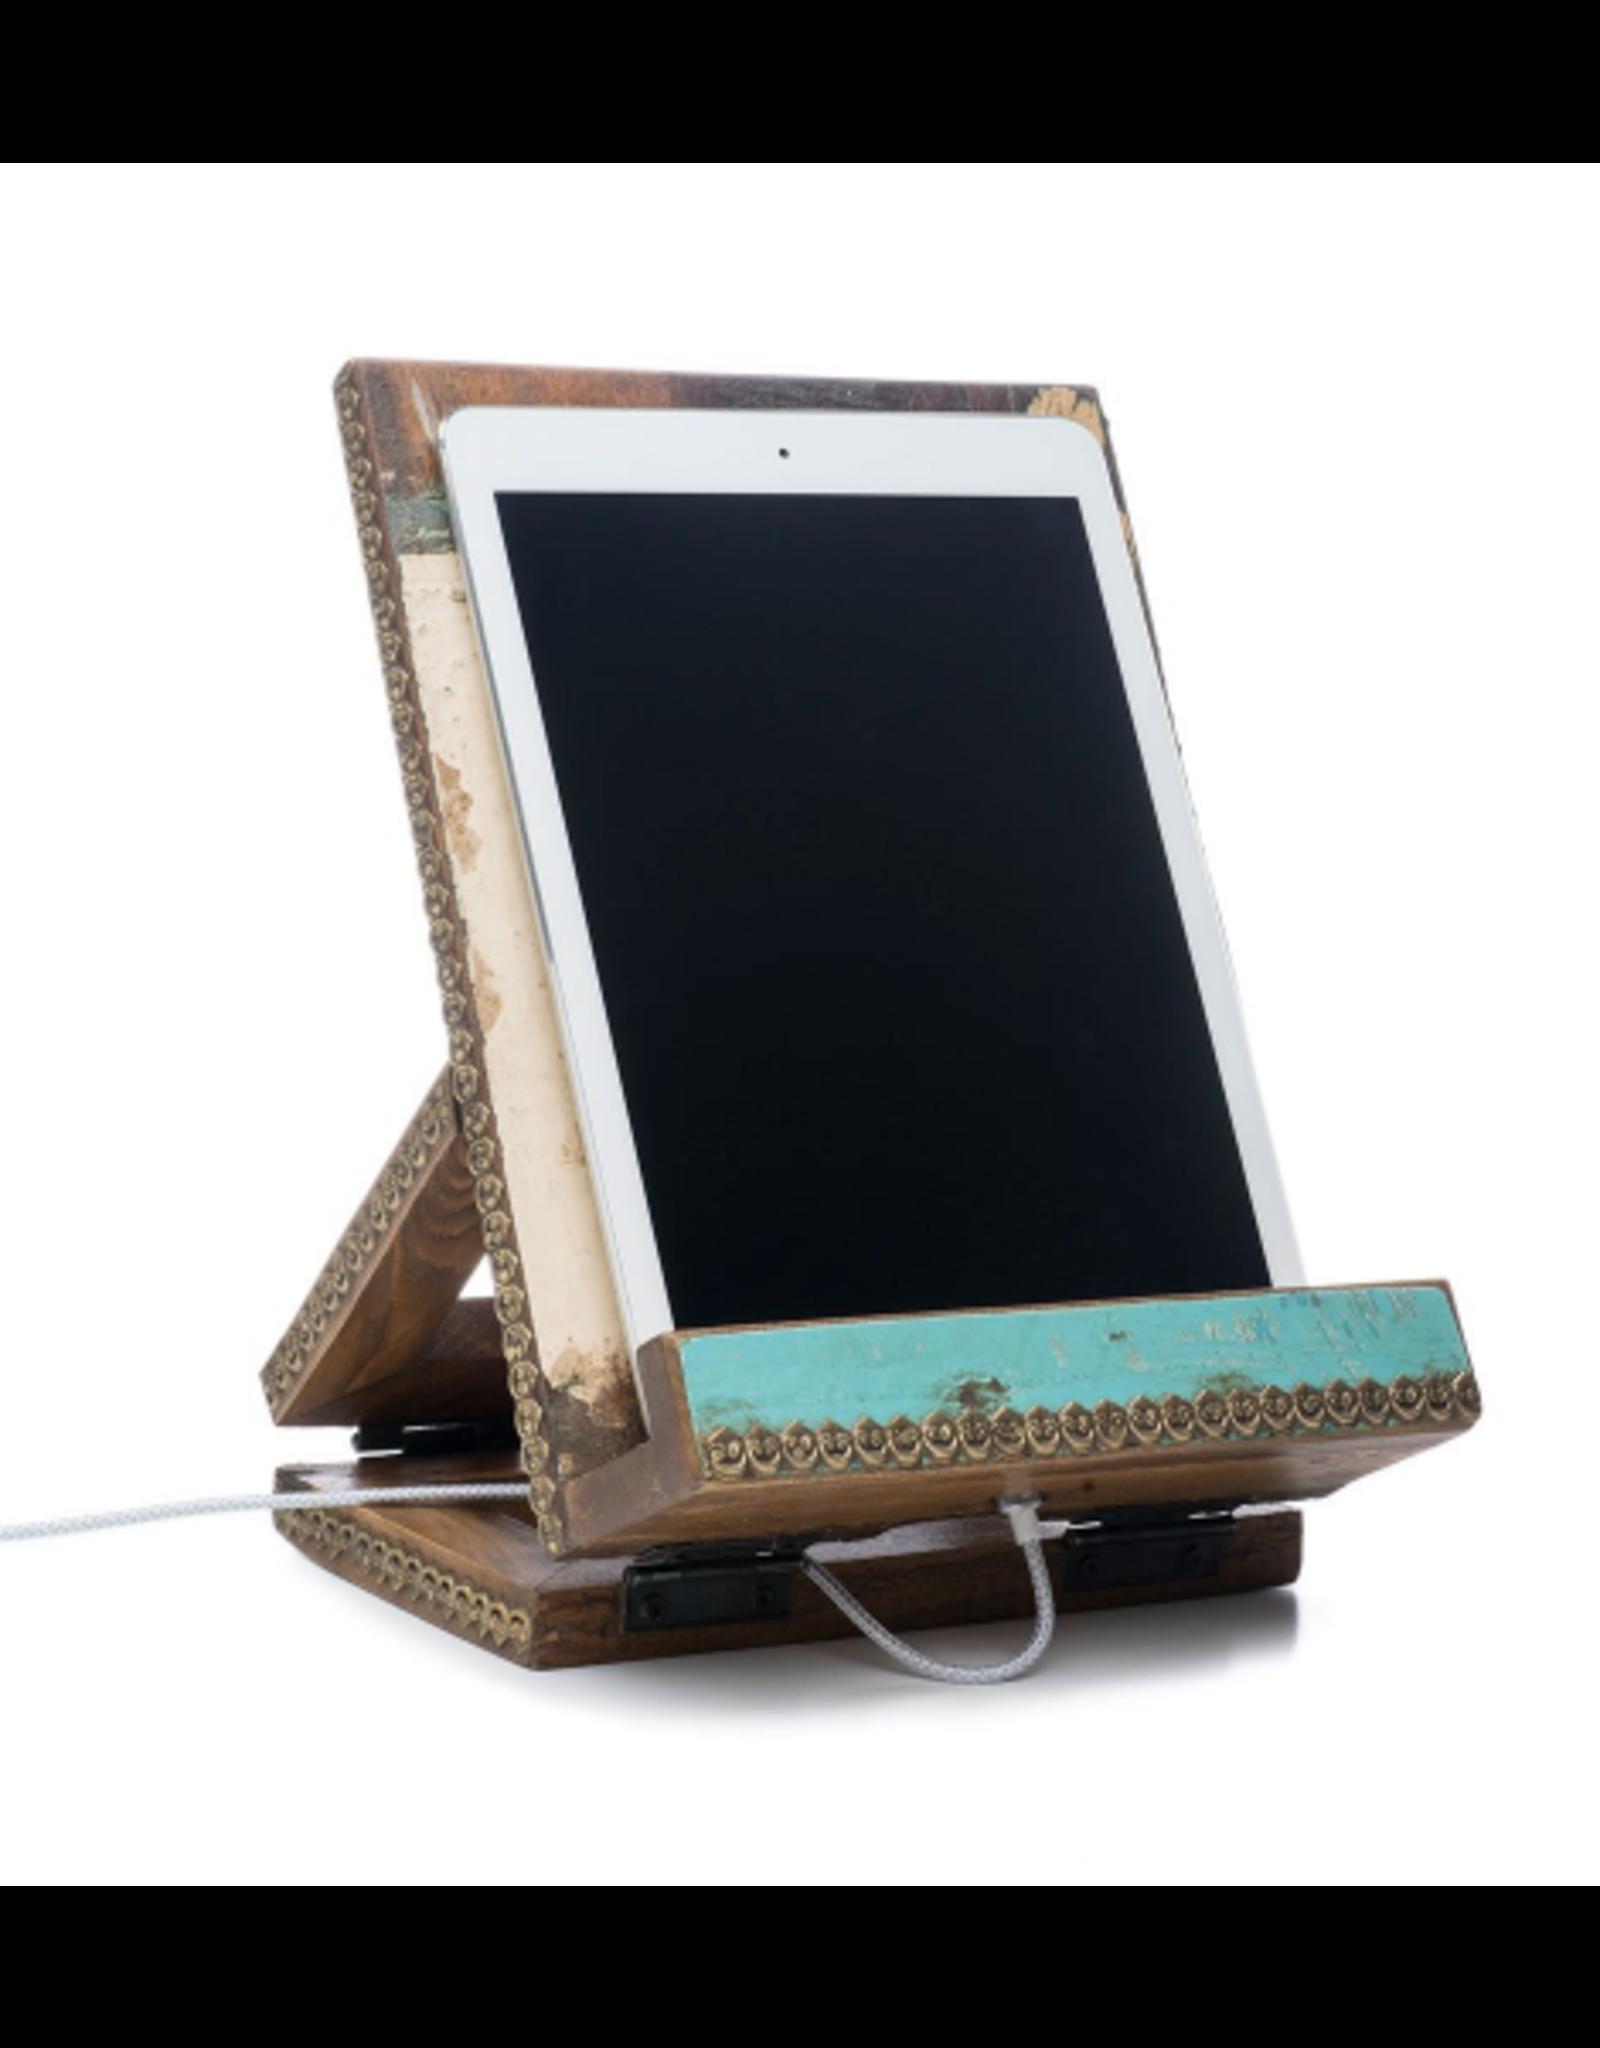 Matr Boomie Puri Beach House Tablet/Book Stand